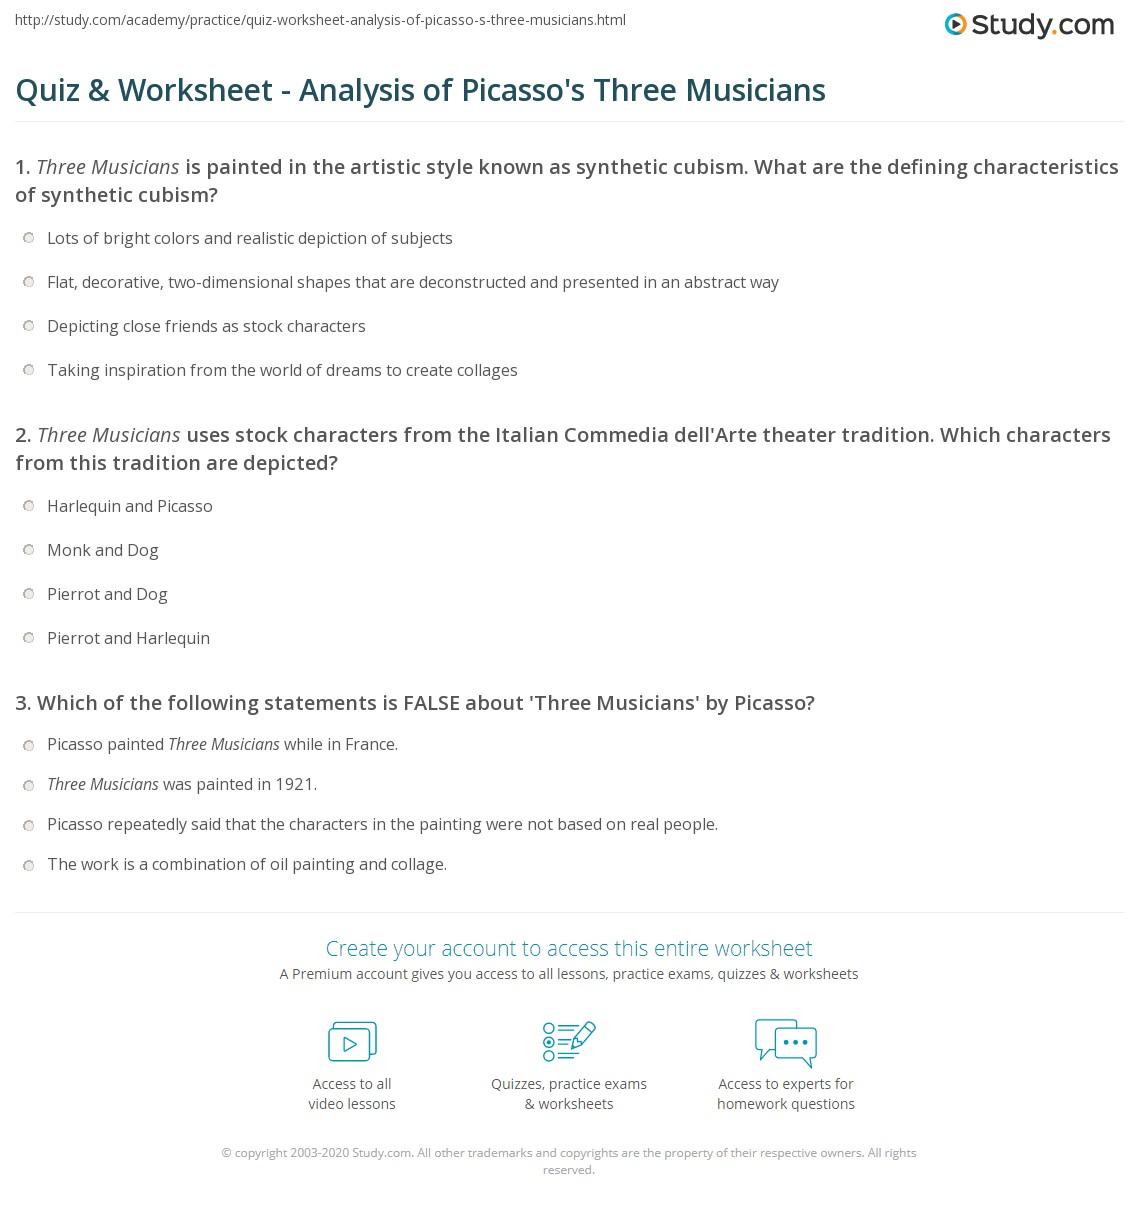 Quiz & Worksheet - Analysis of Picasso's Three Musicians   Study.com